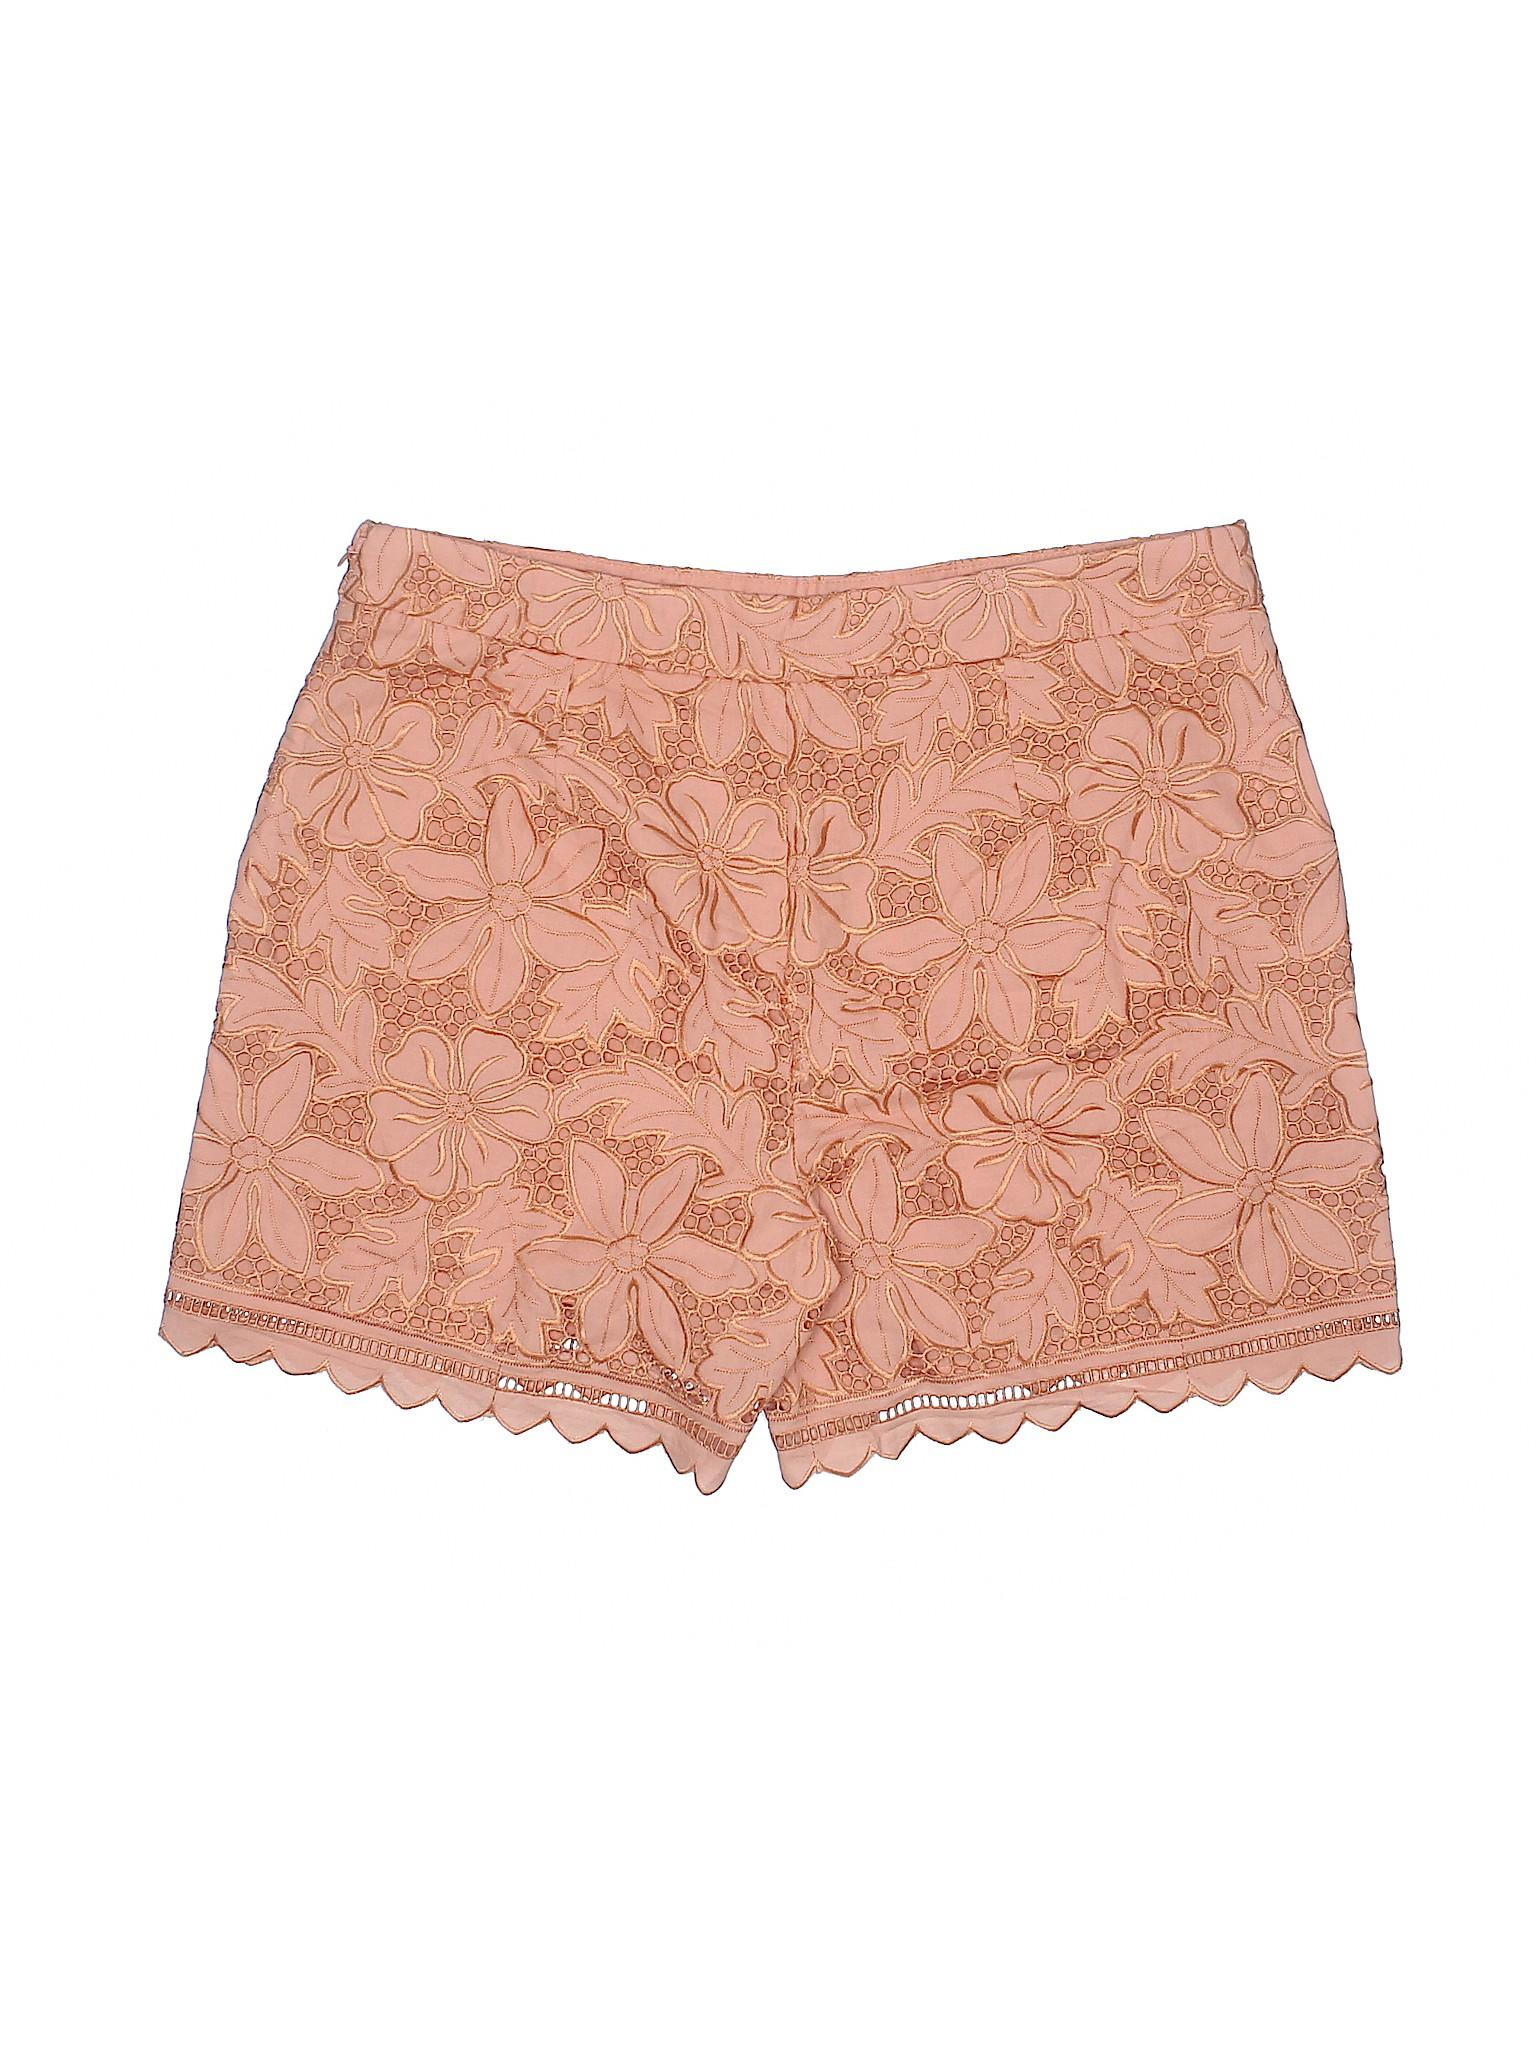 Boutique Boutique Taylor Ann Ann Taylor Boutique Taylor Ann Shorts Shorts Shorts pEqOg